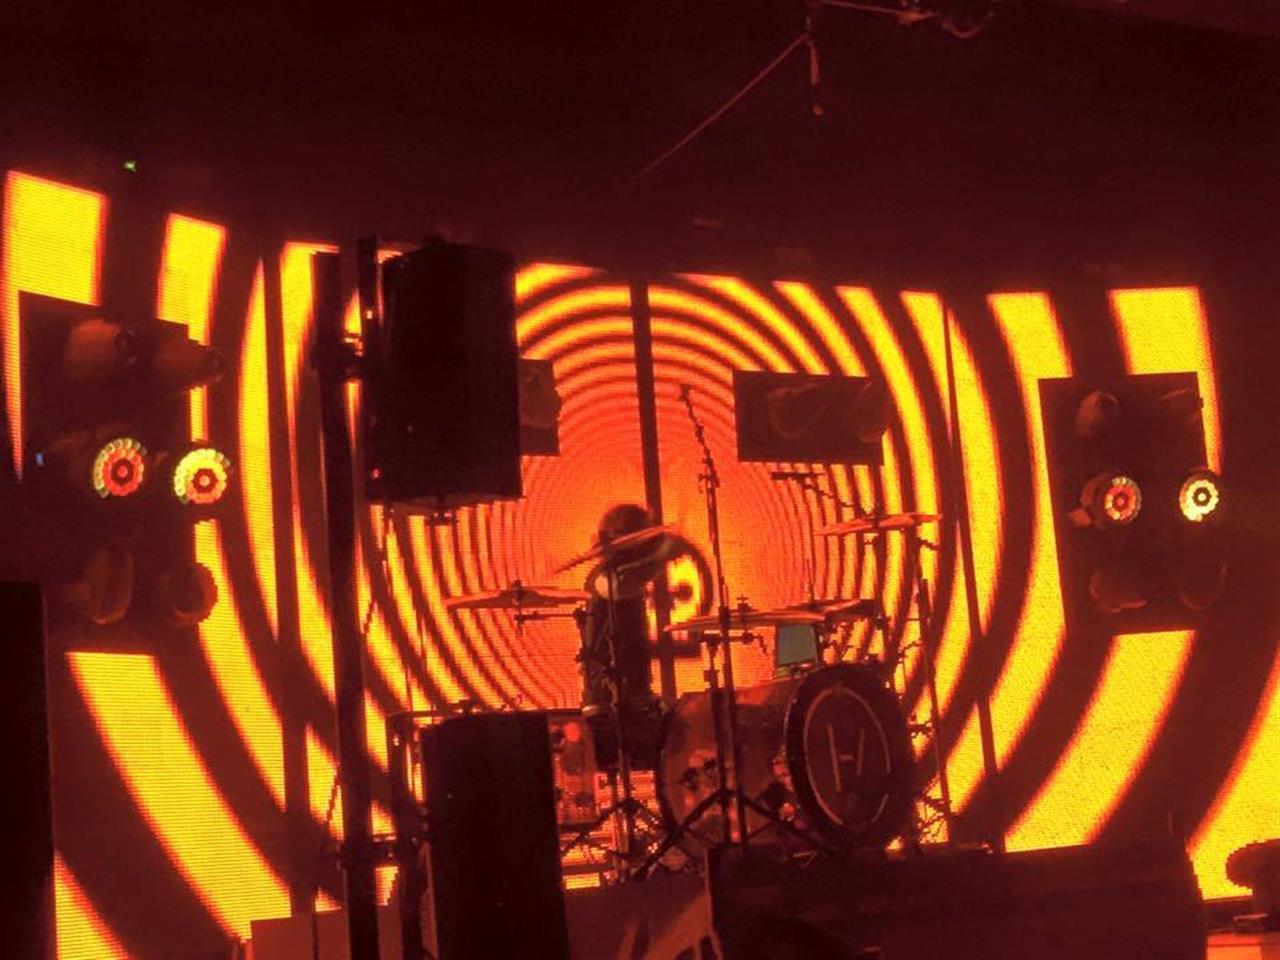 Twenty One Pilots performing at DTE Music Theatre #Clarkston #Michigan